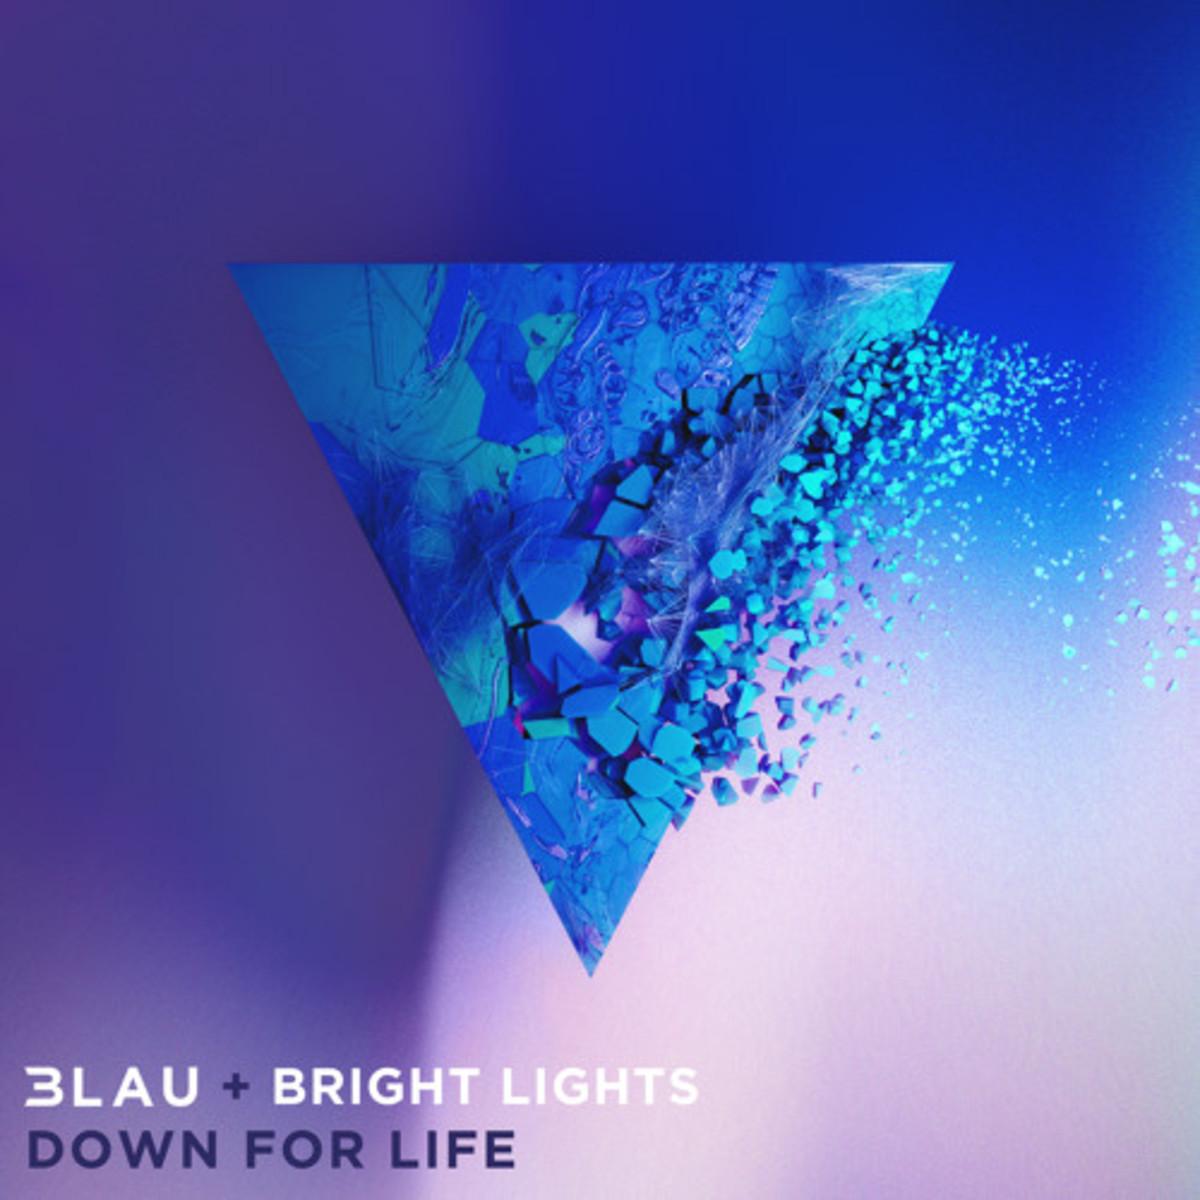 3LAU & Bright Lights - Down For Life (ALBUM ART)